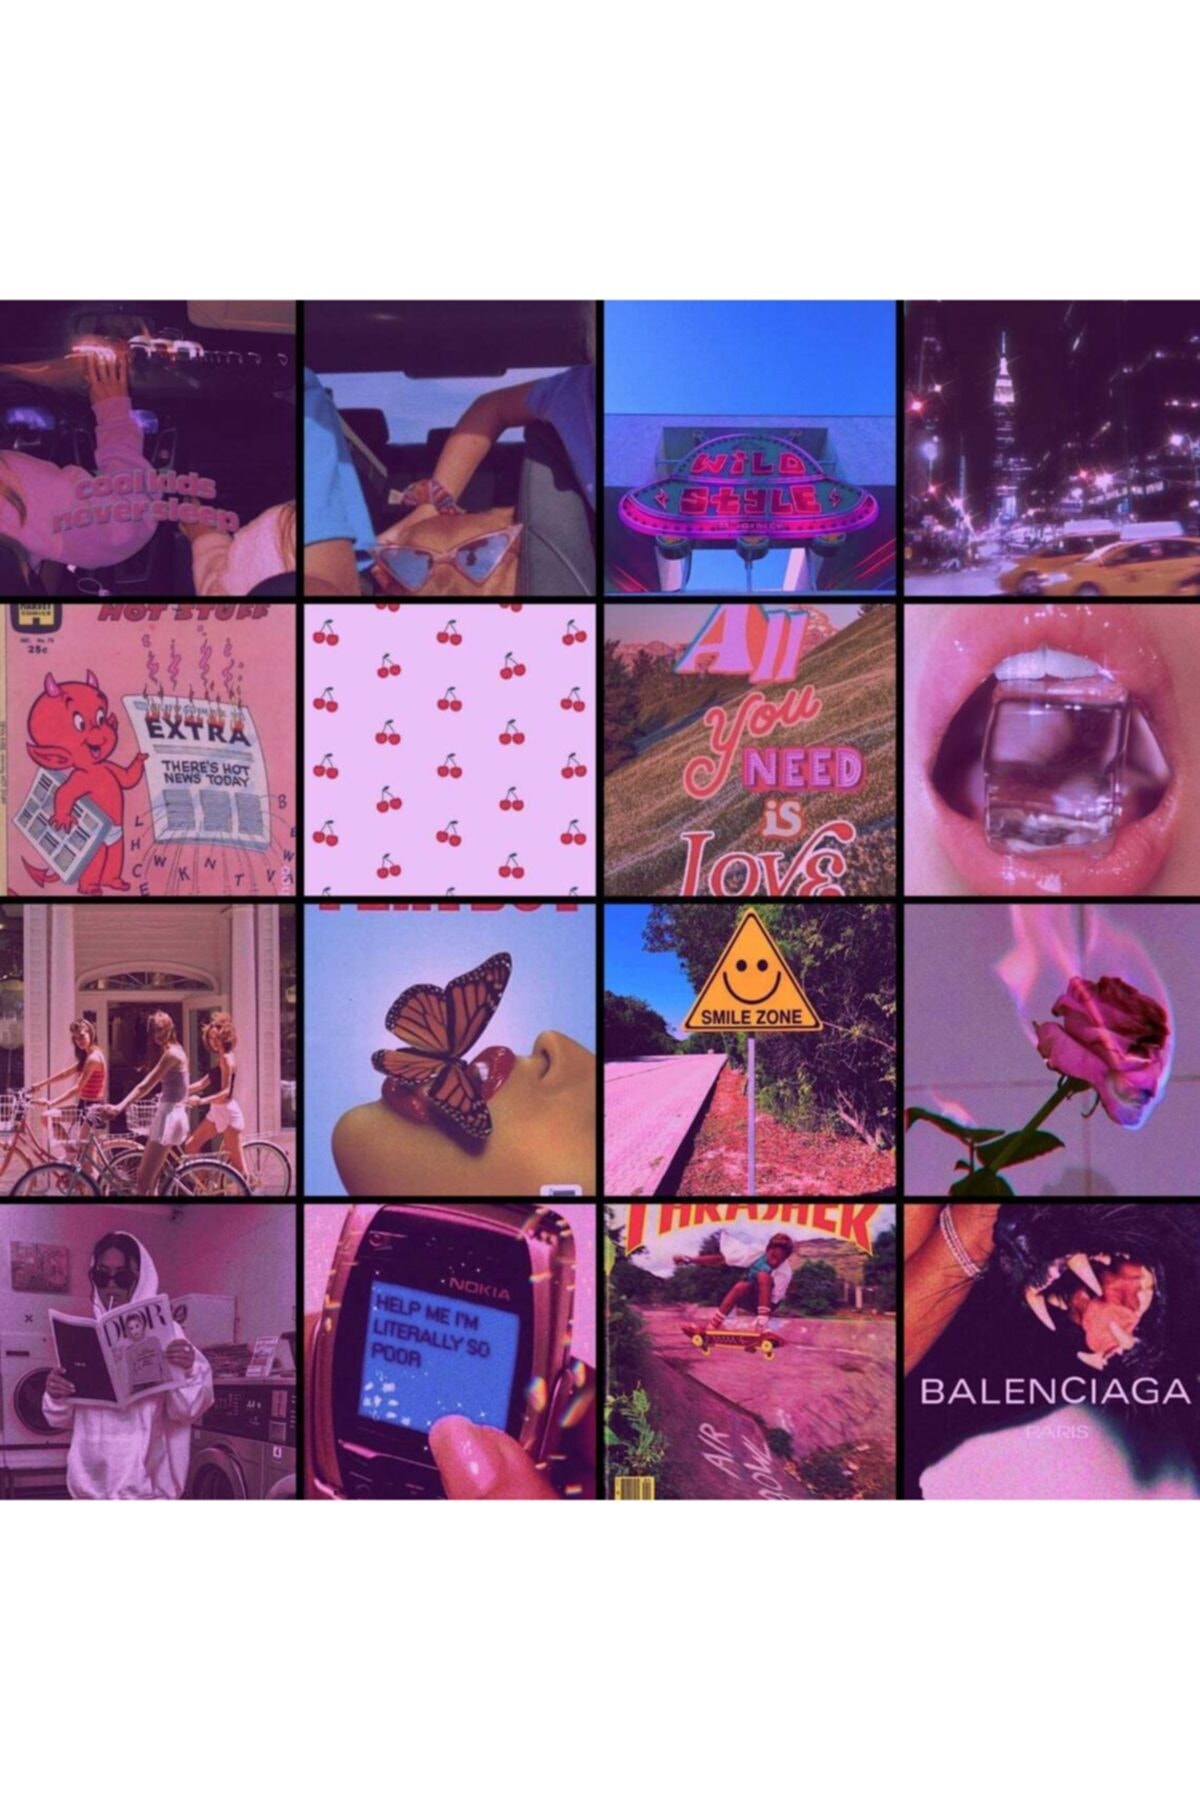 bukashops Aesthetic Pink Indie 60'lı Duvar Posteri Seti 2